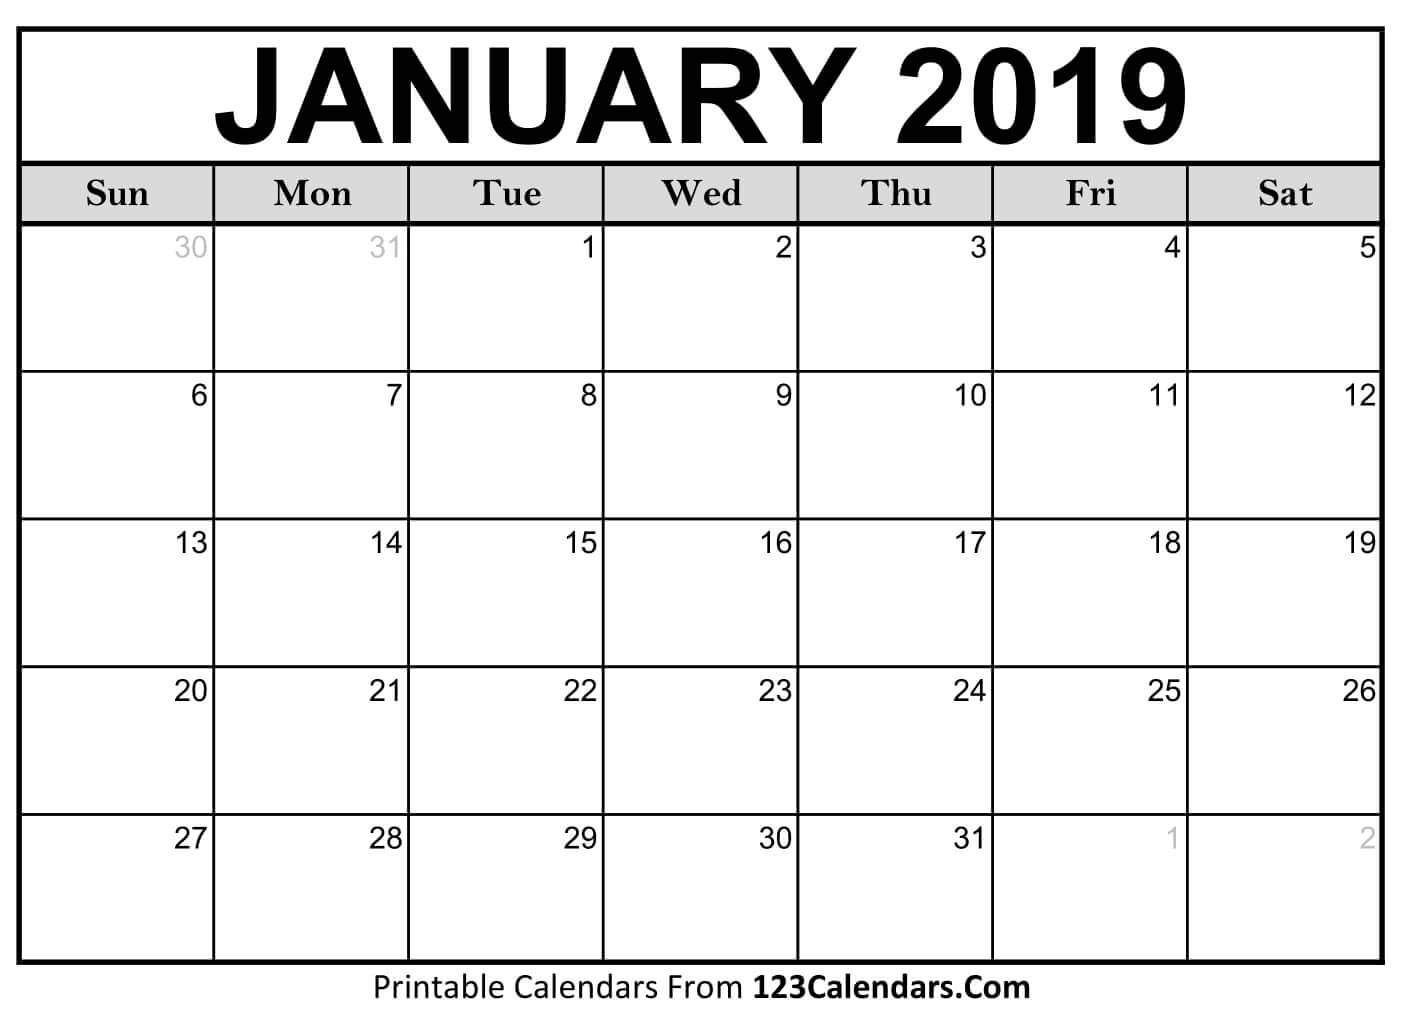 Printable January 2019 Calendar Templates - 123Calendars 2019 Calendars